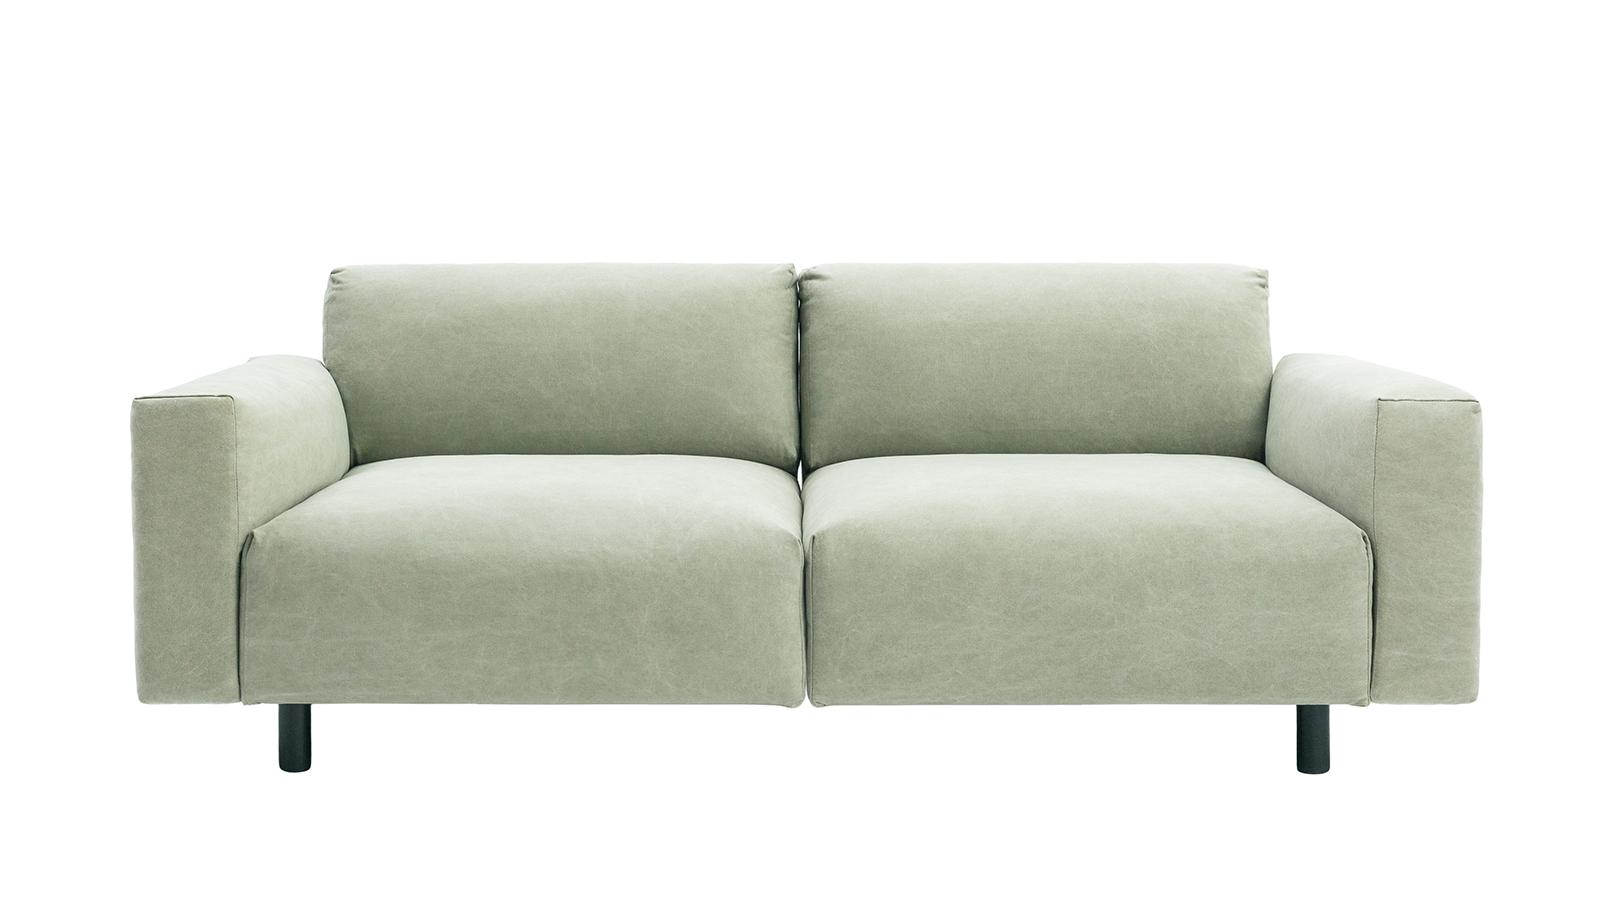 koti sofa ottoman by form us with love for hem sohomod. Black Bedroom Furniture Sets. Home Design Ideas